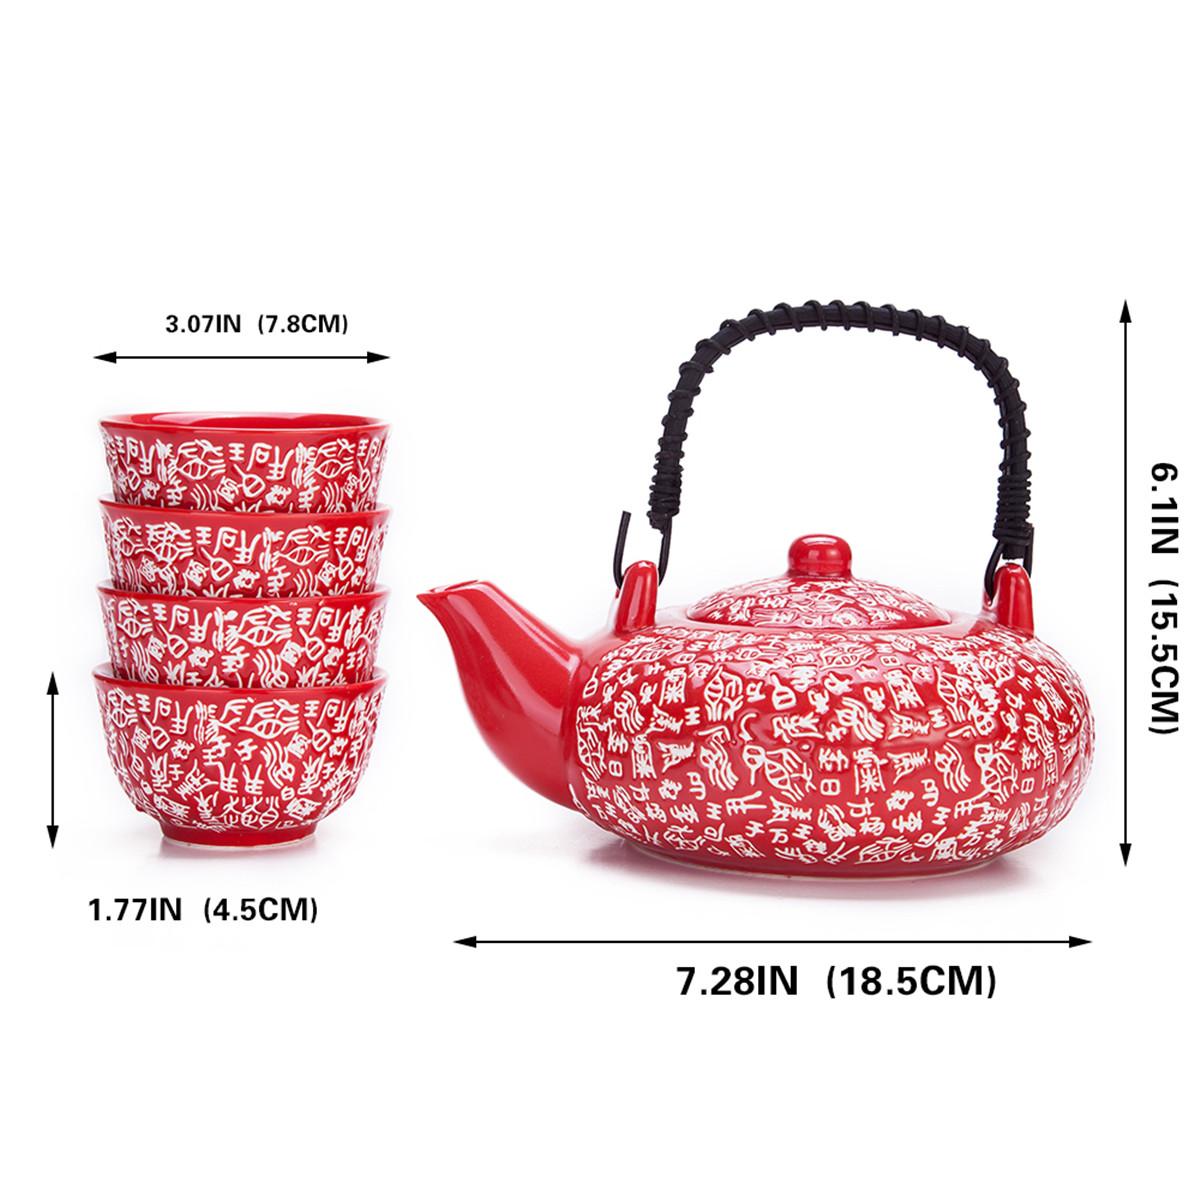 Contemporary Art Decor Porcelain 5 PCS Tea Set Teapot Teacup Kanji Calligraphy Red THY TRADING